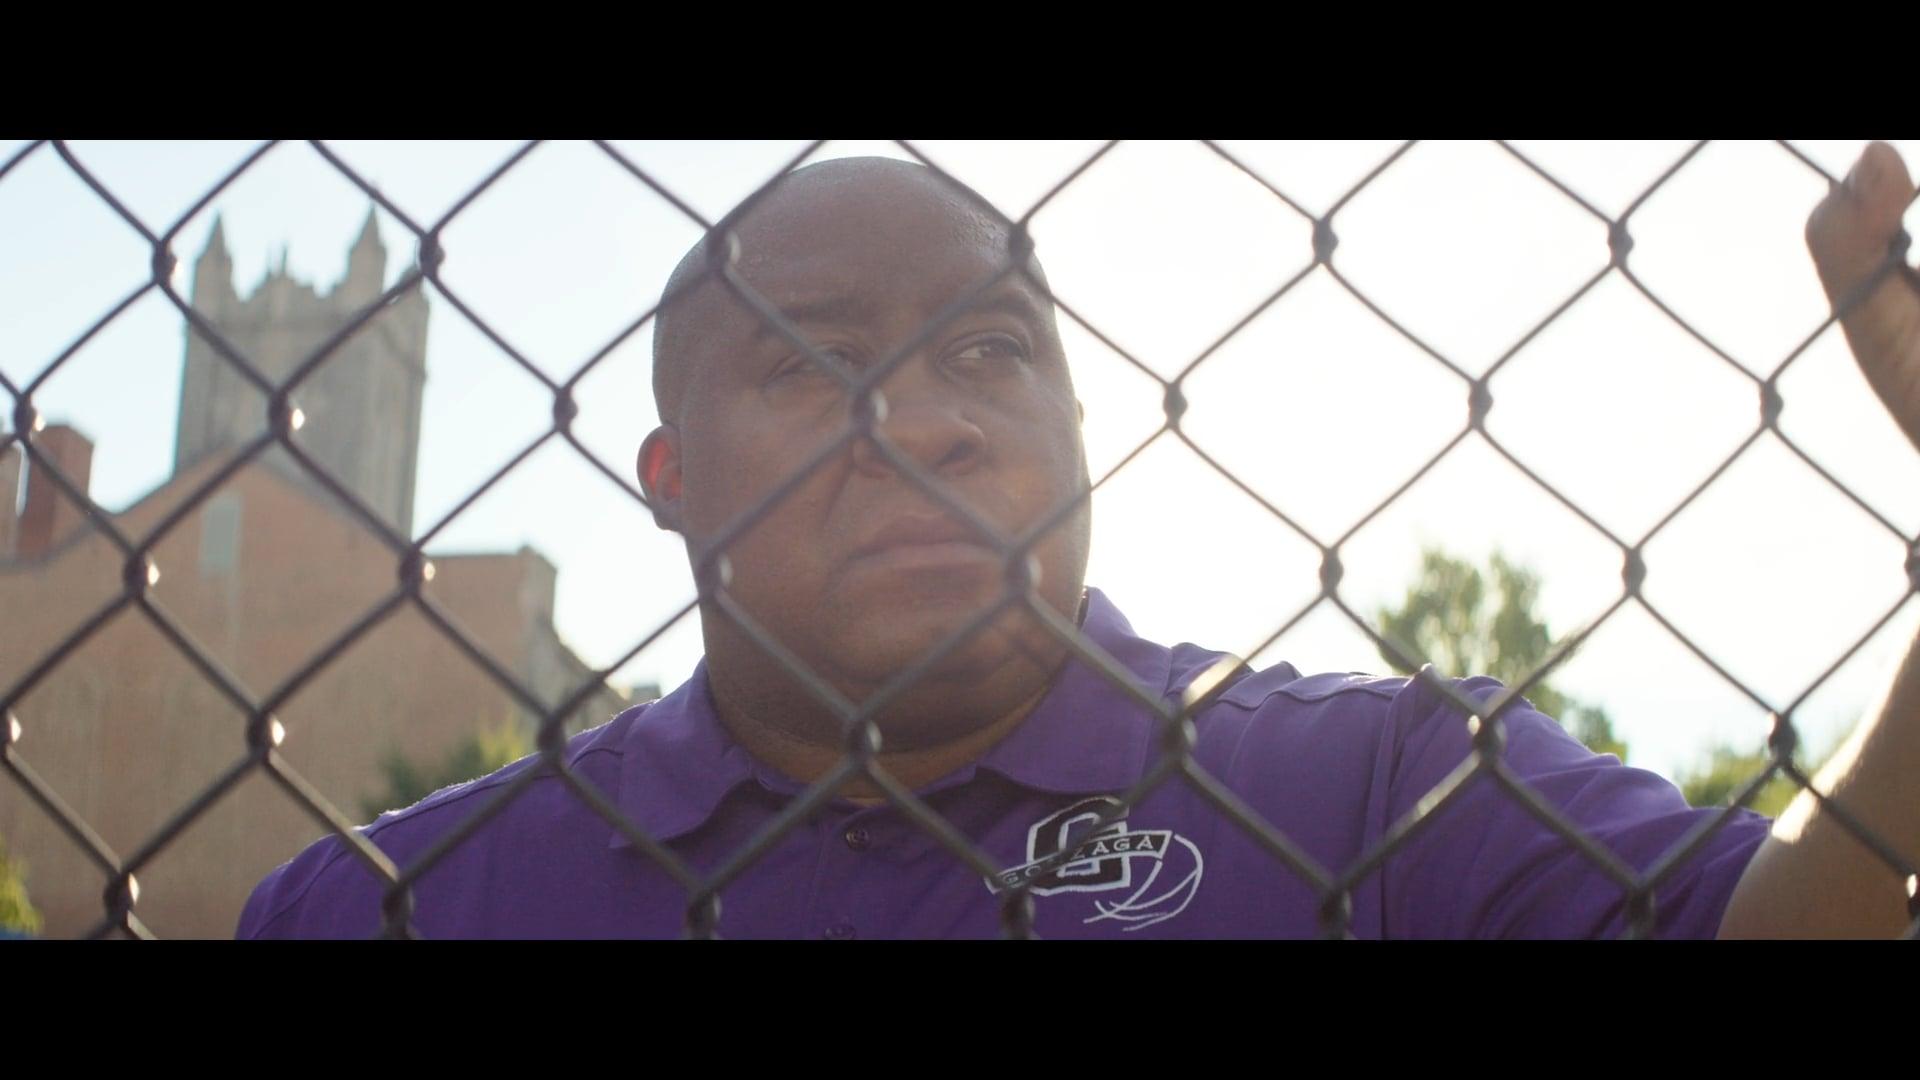 Gatorade - Coach Turner